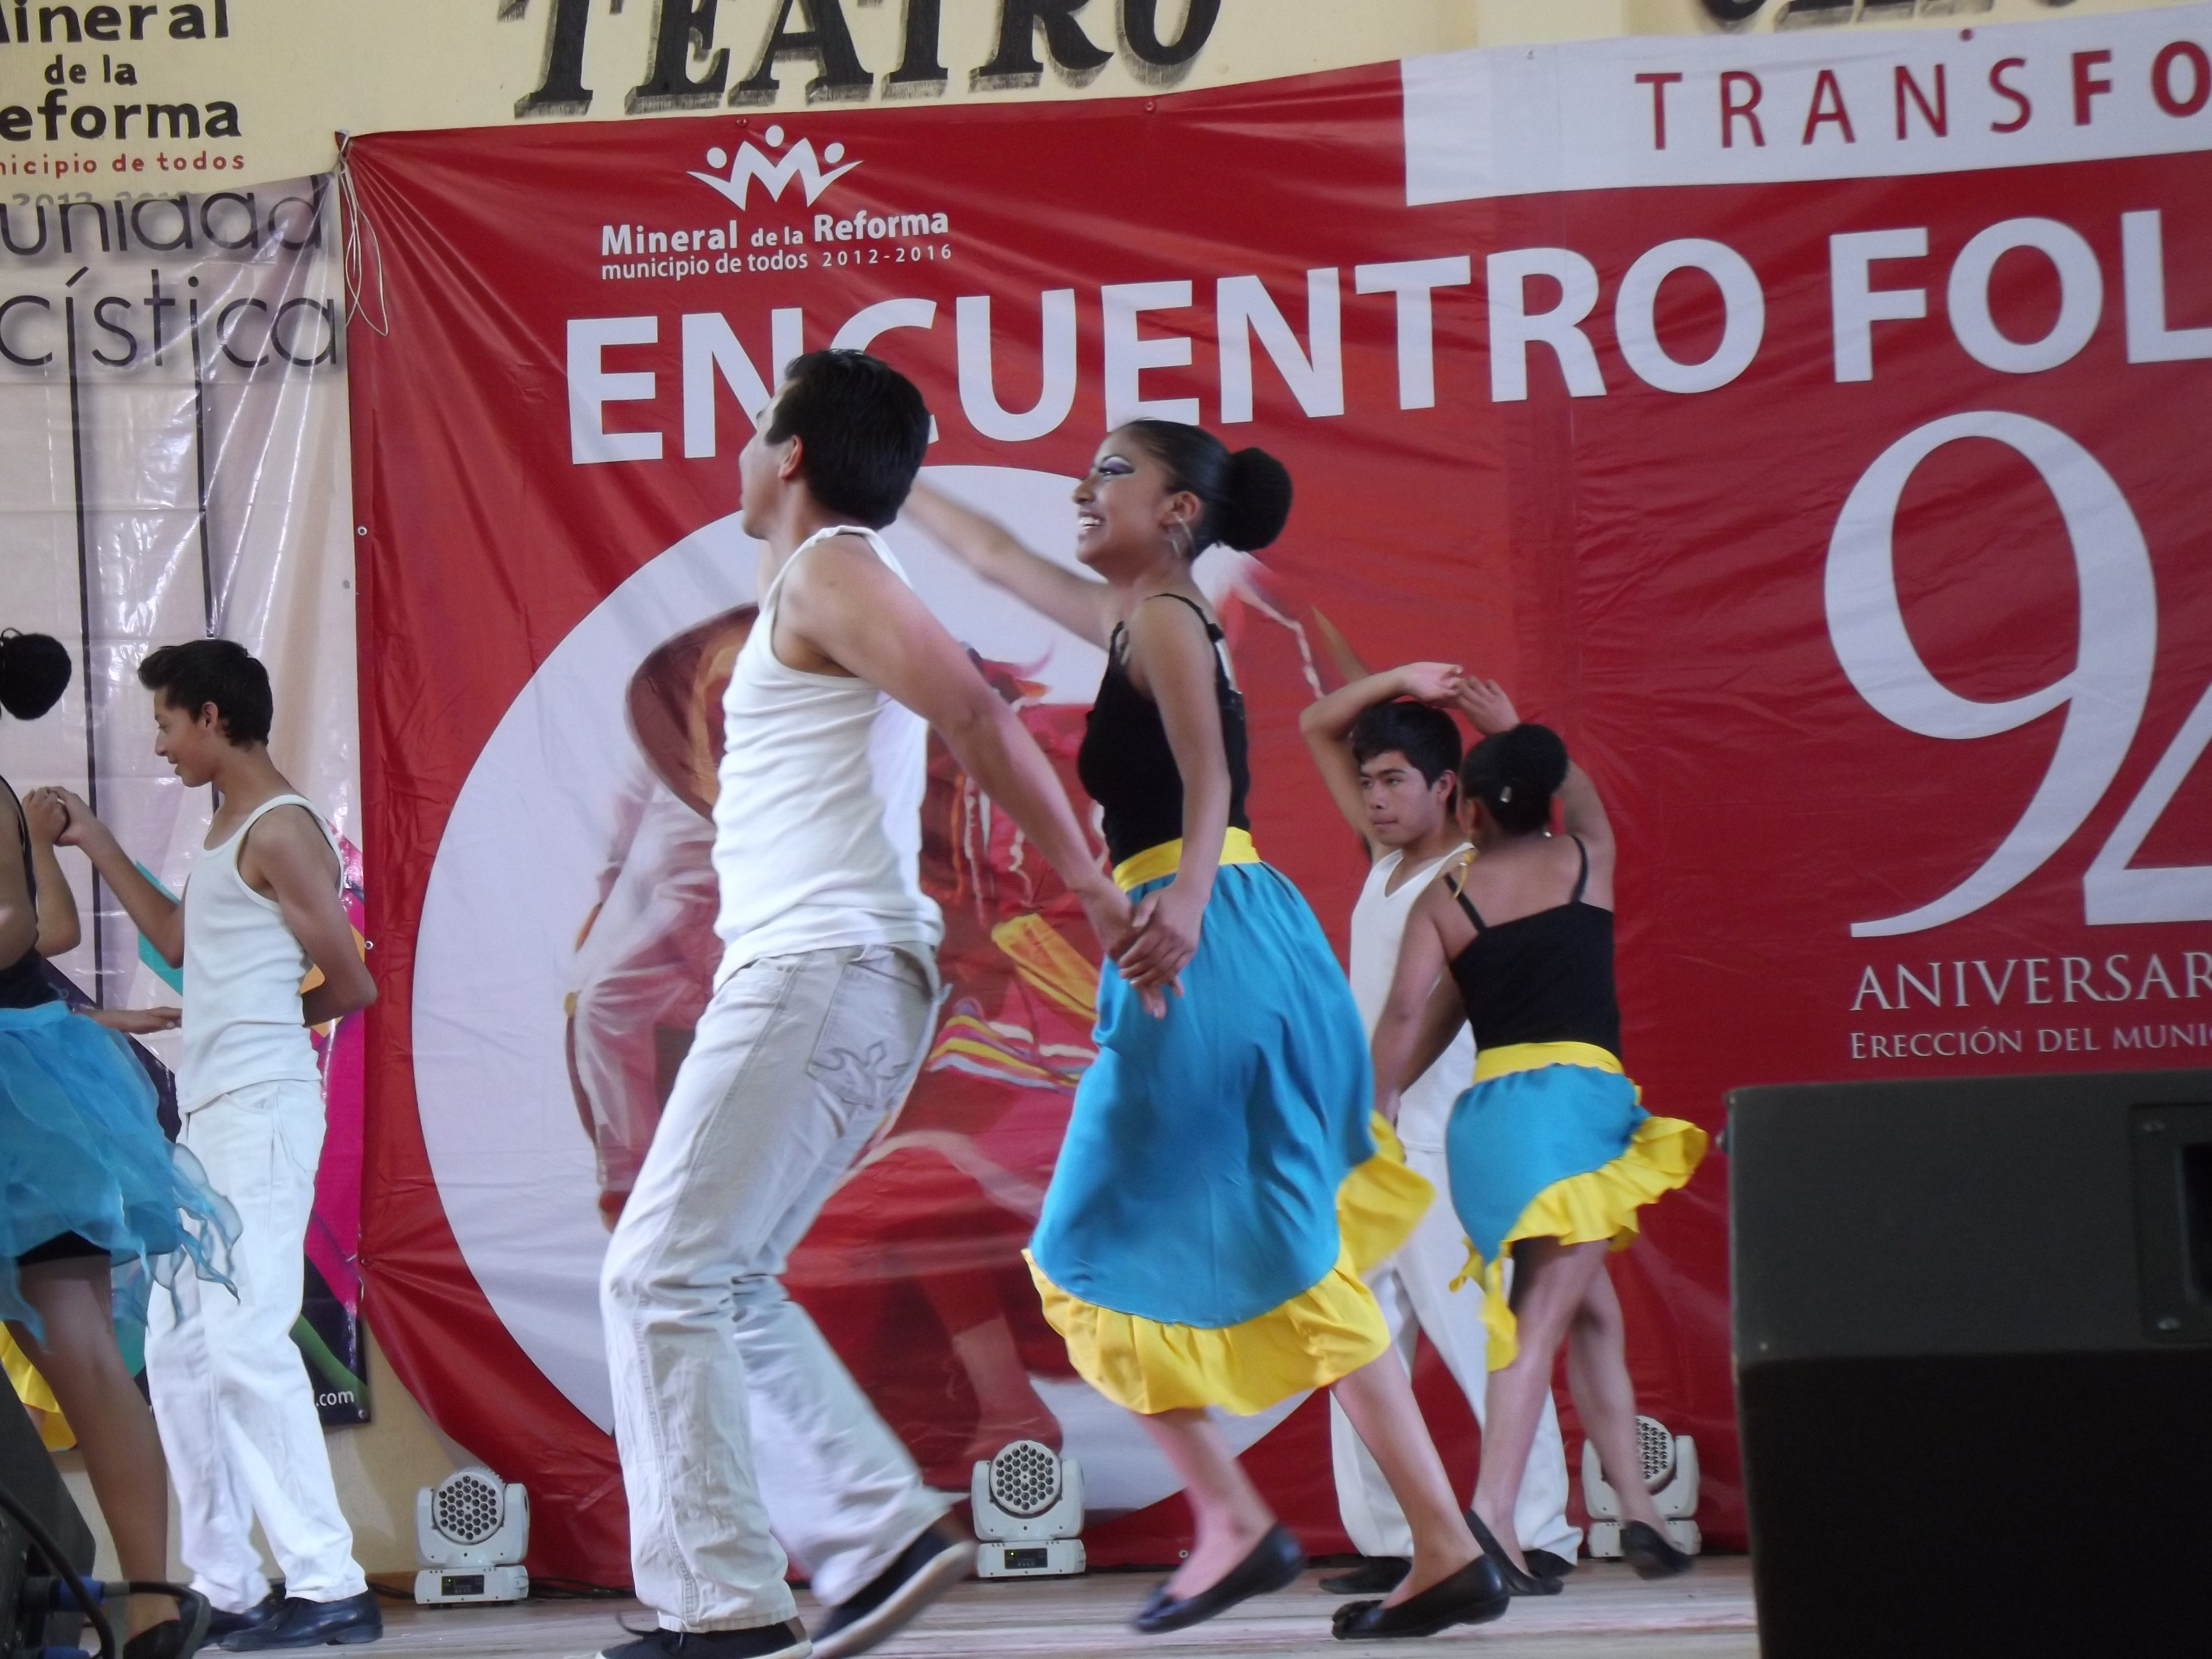 COMPAÑIA DE ESPECTACULAR DANCE